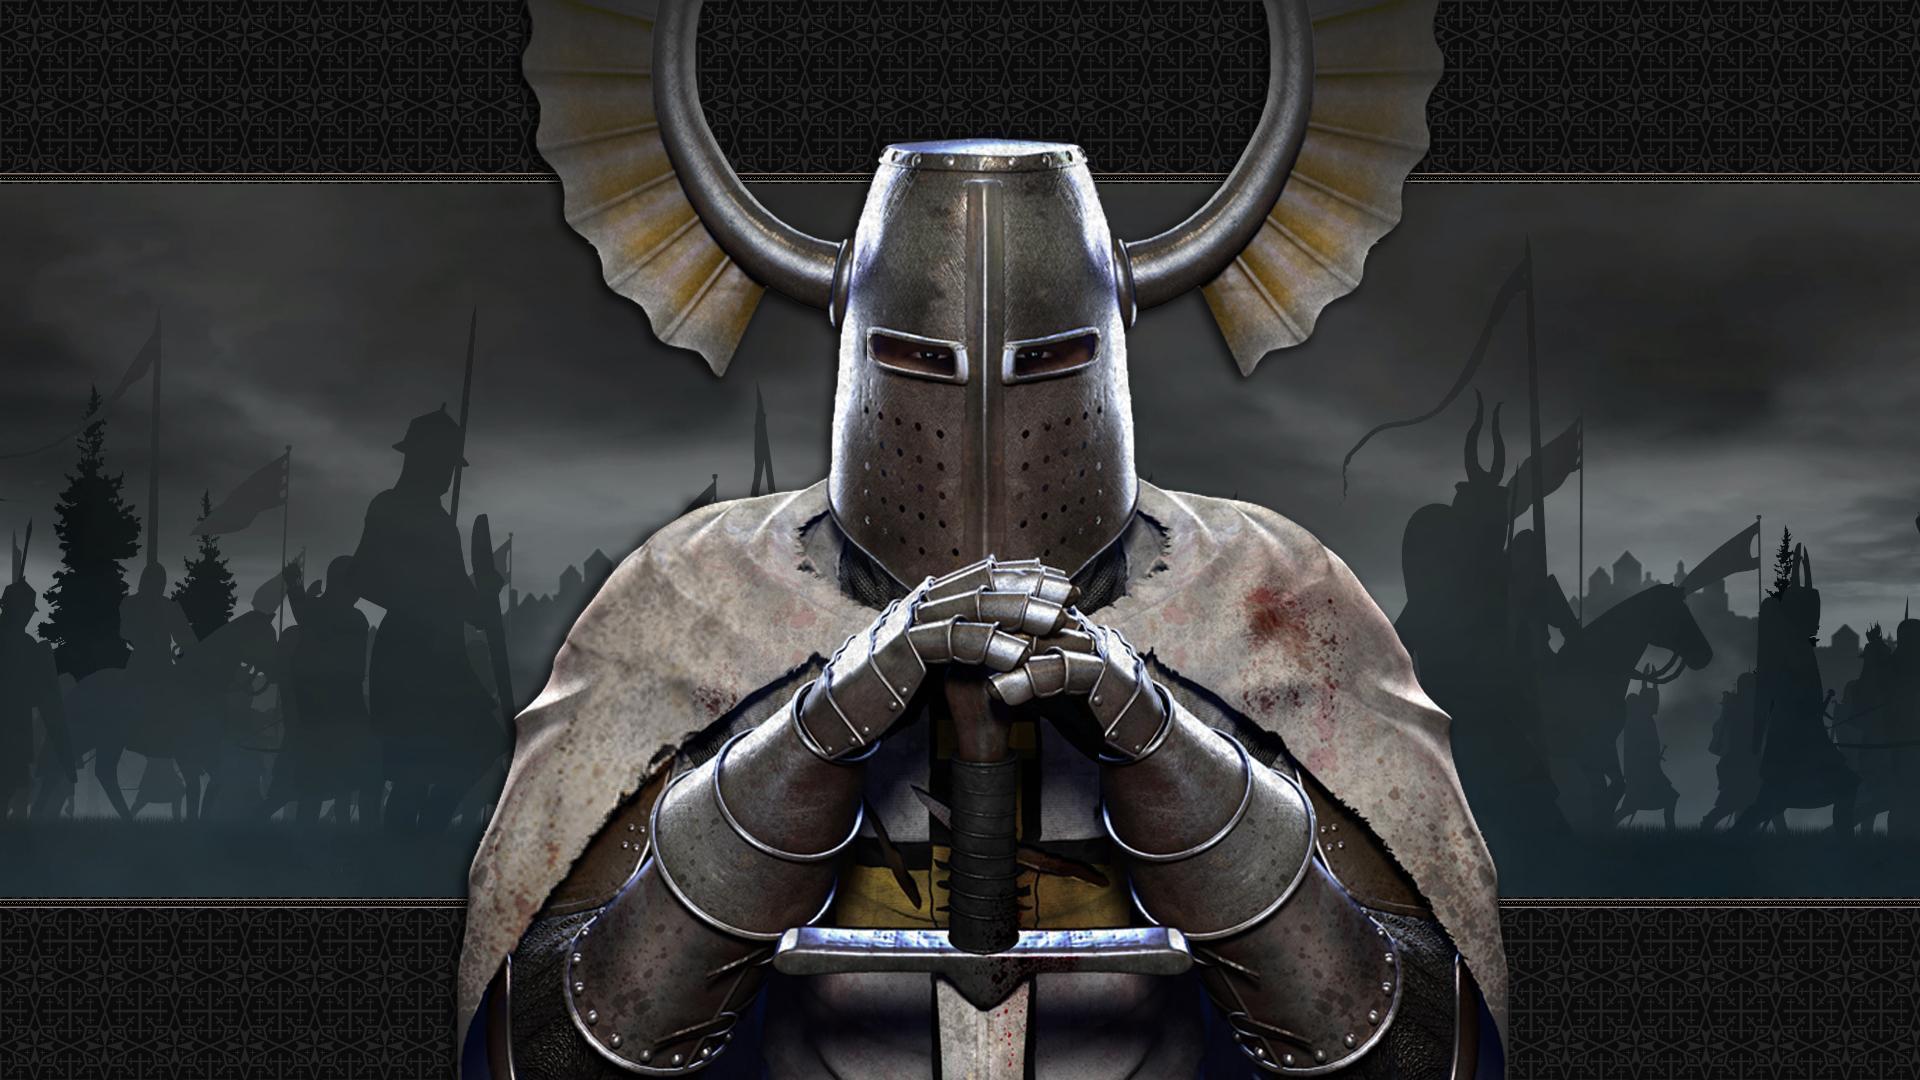 teutonic knight computer wallpapers desktop backgrounds